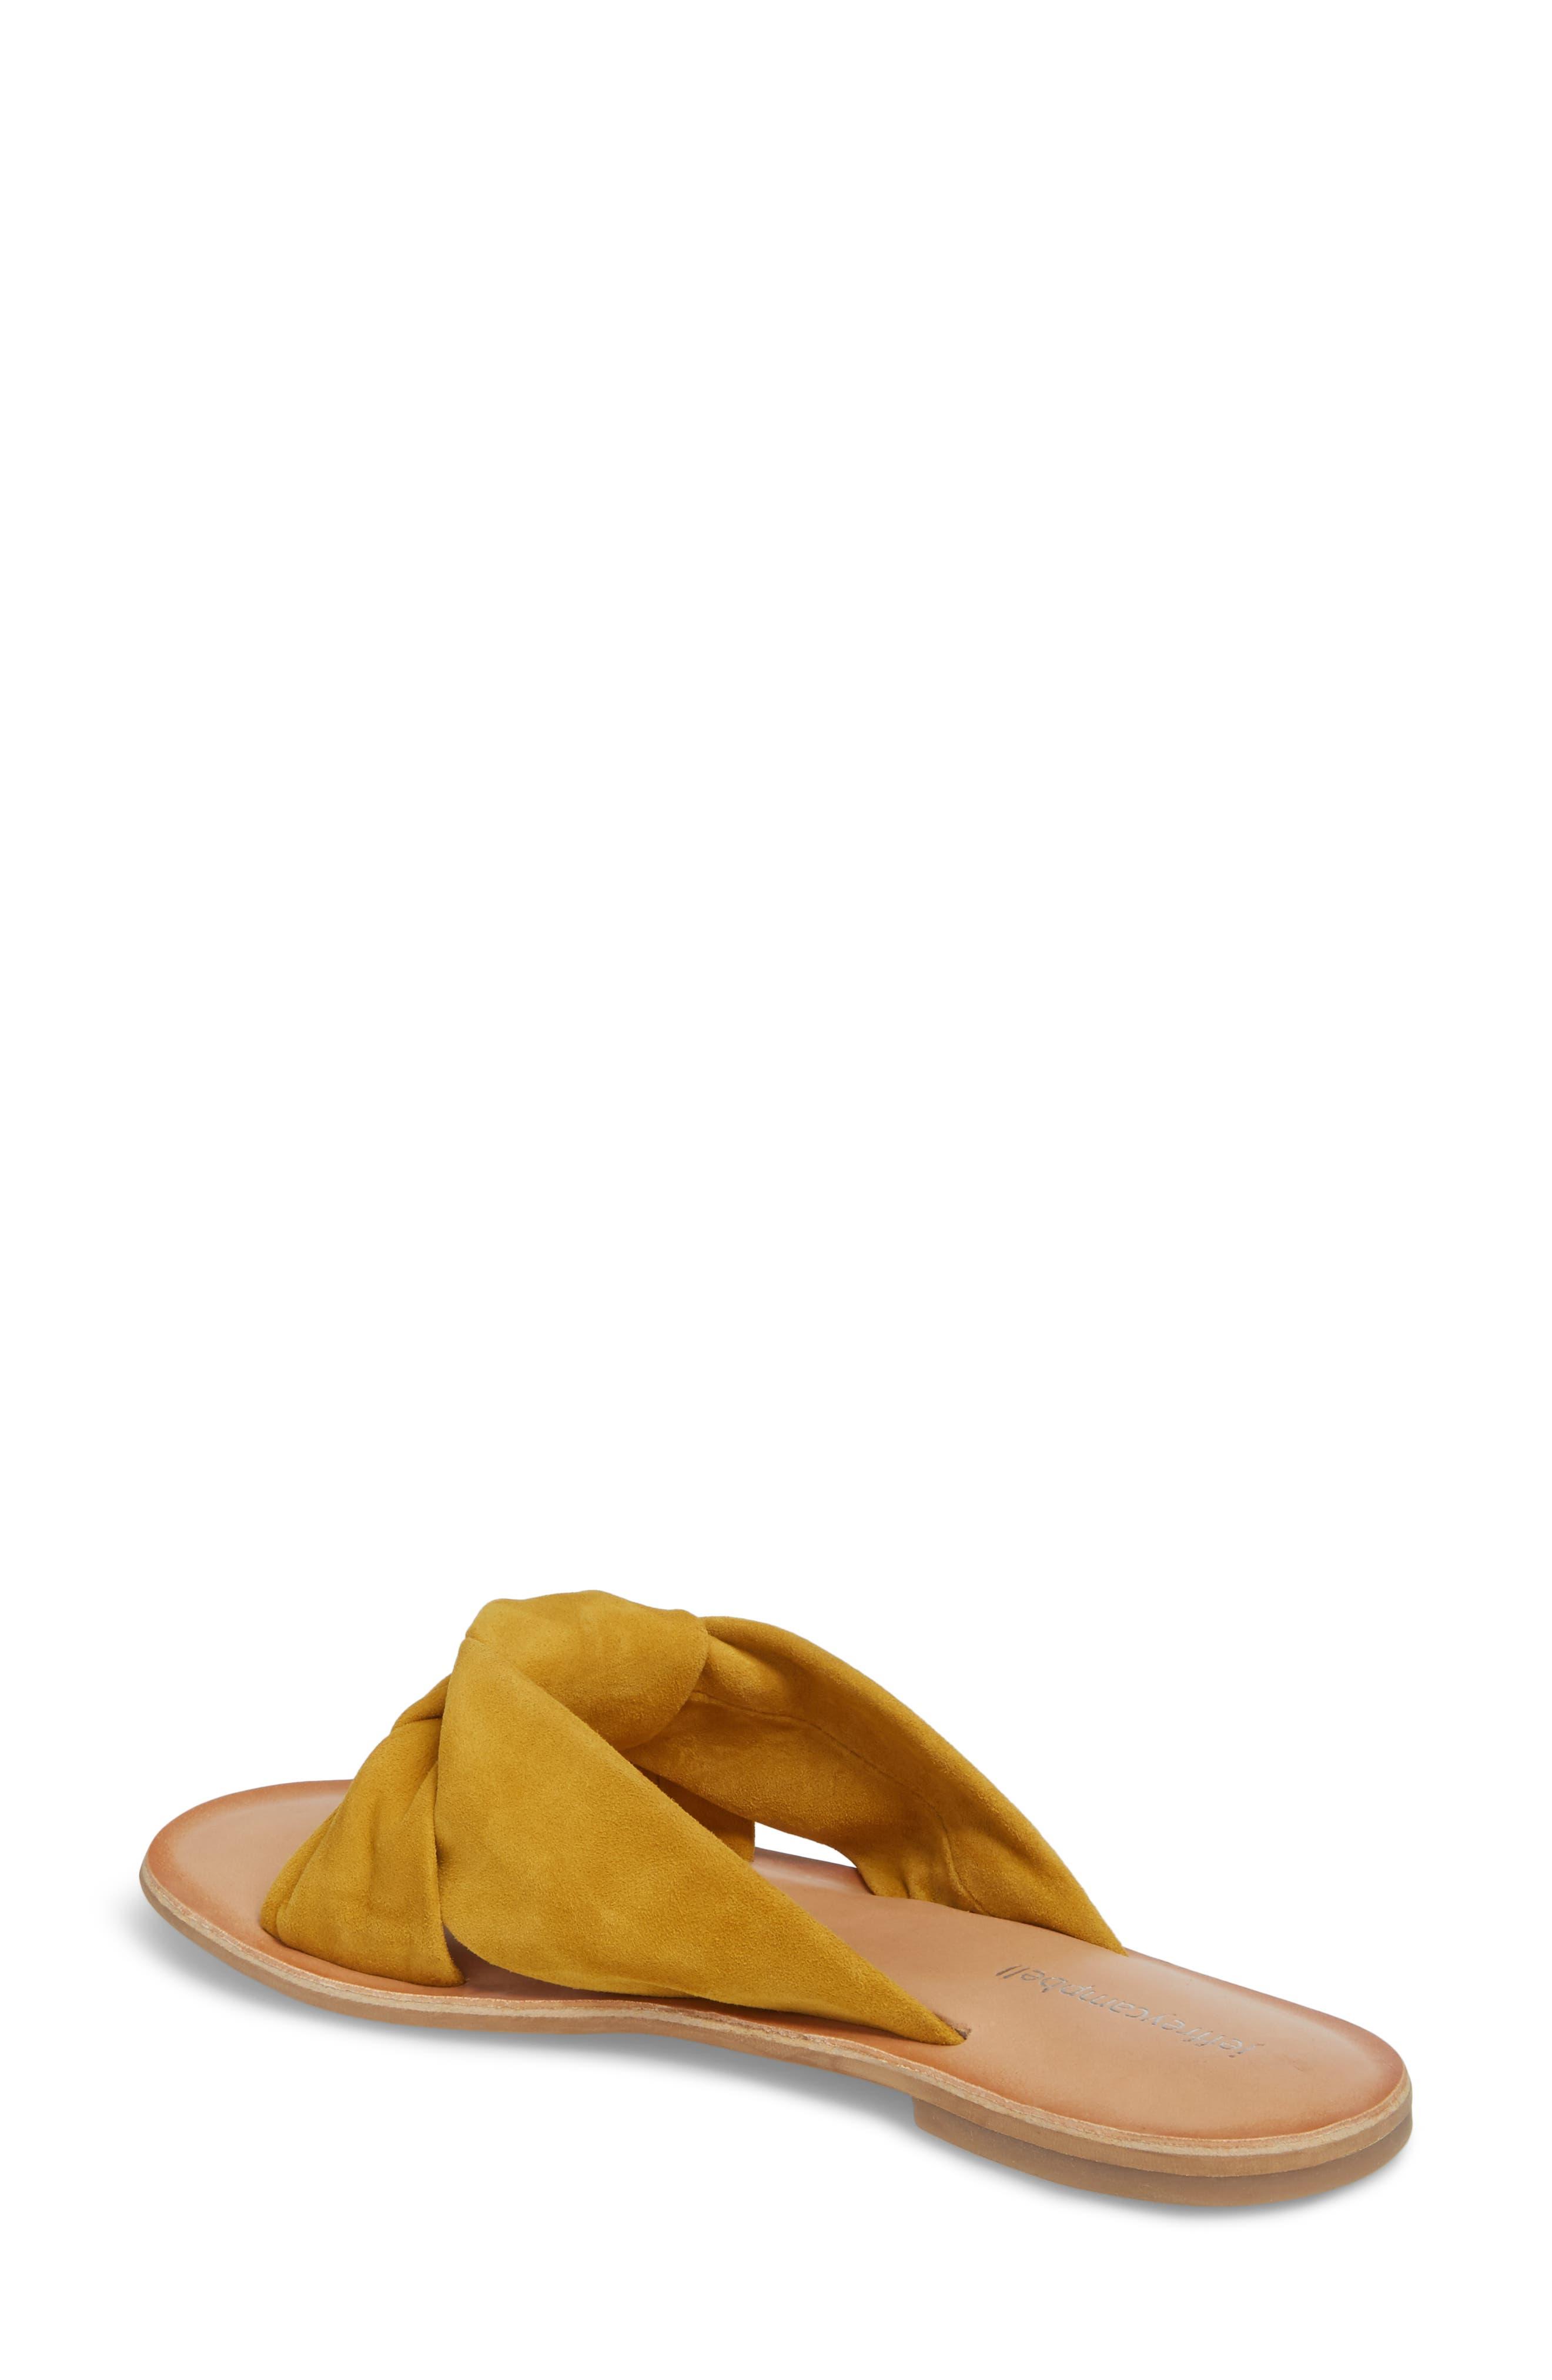 Zocalo Slide Sandal,                             Alternate thumbnail 2, color,                             Mustard Suede